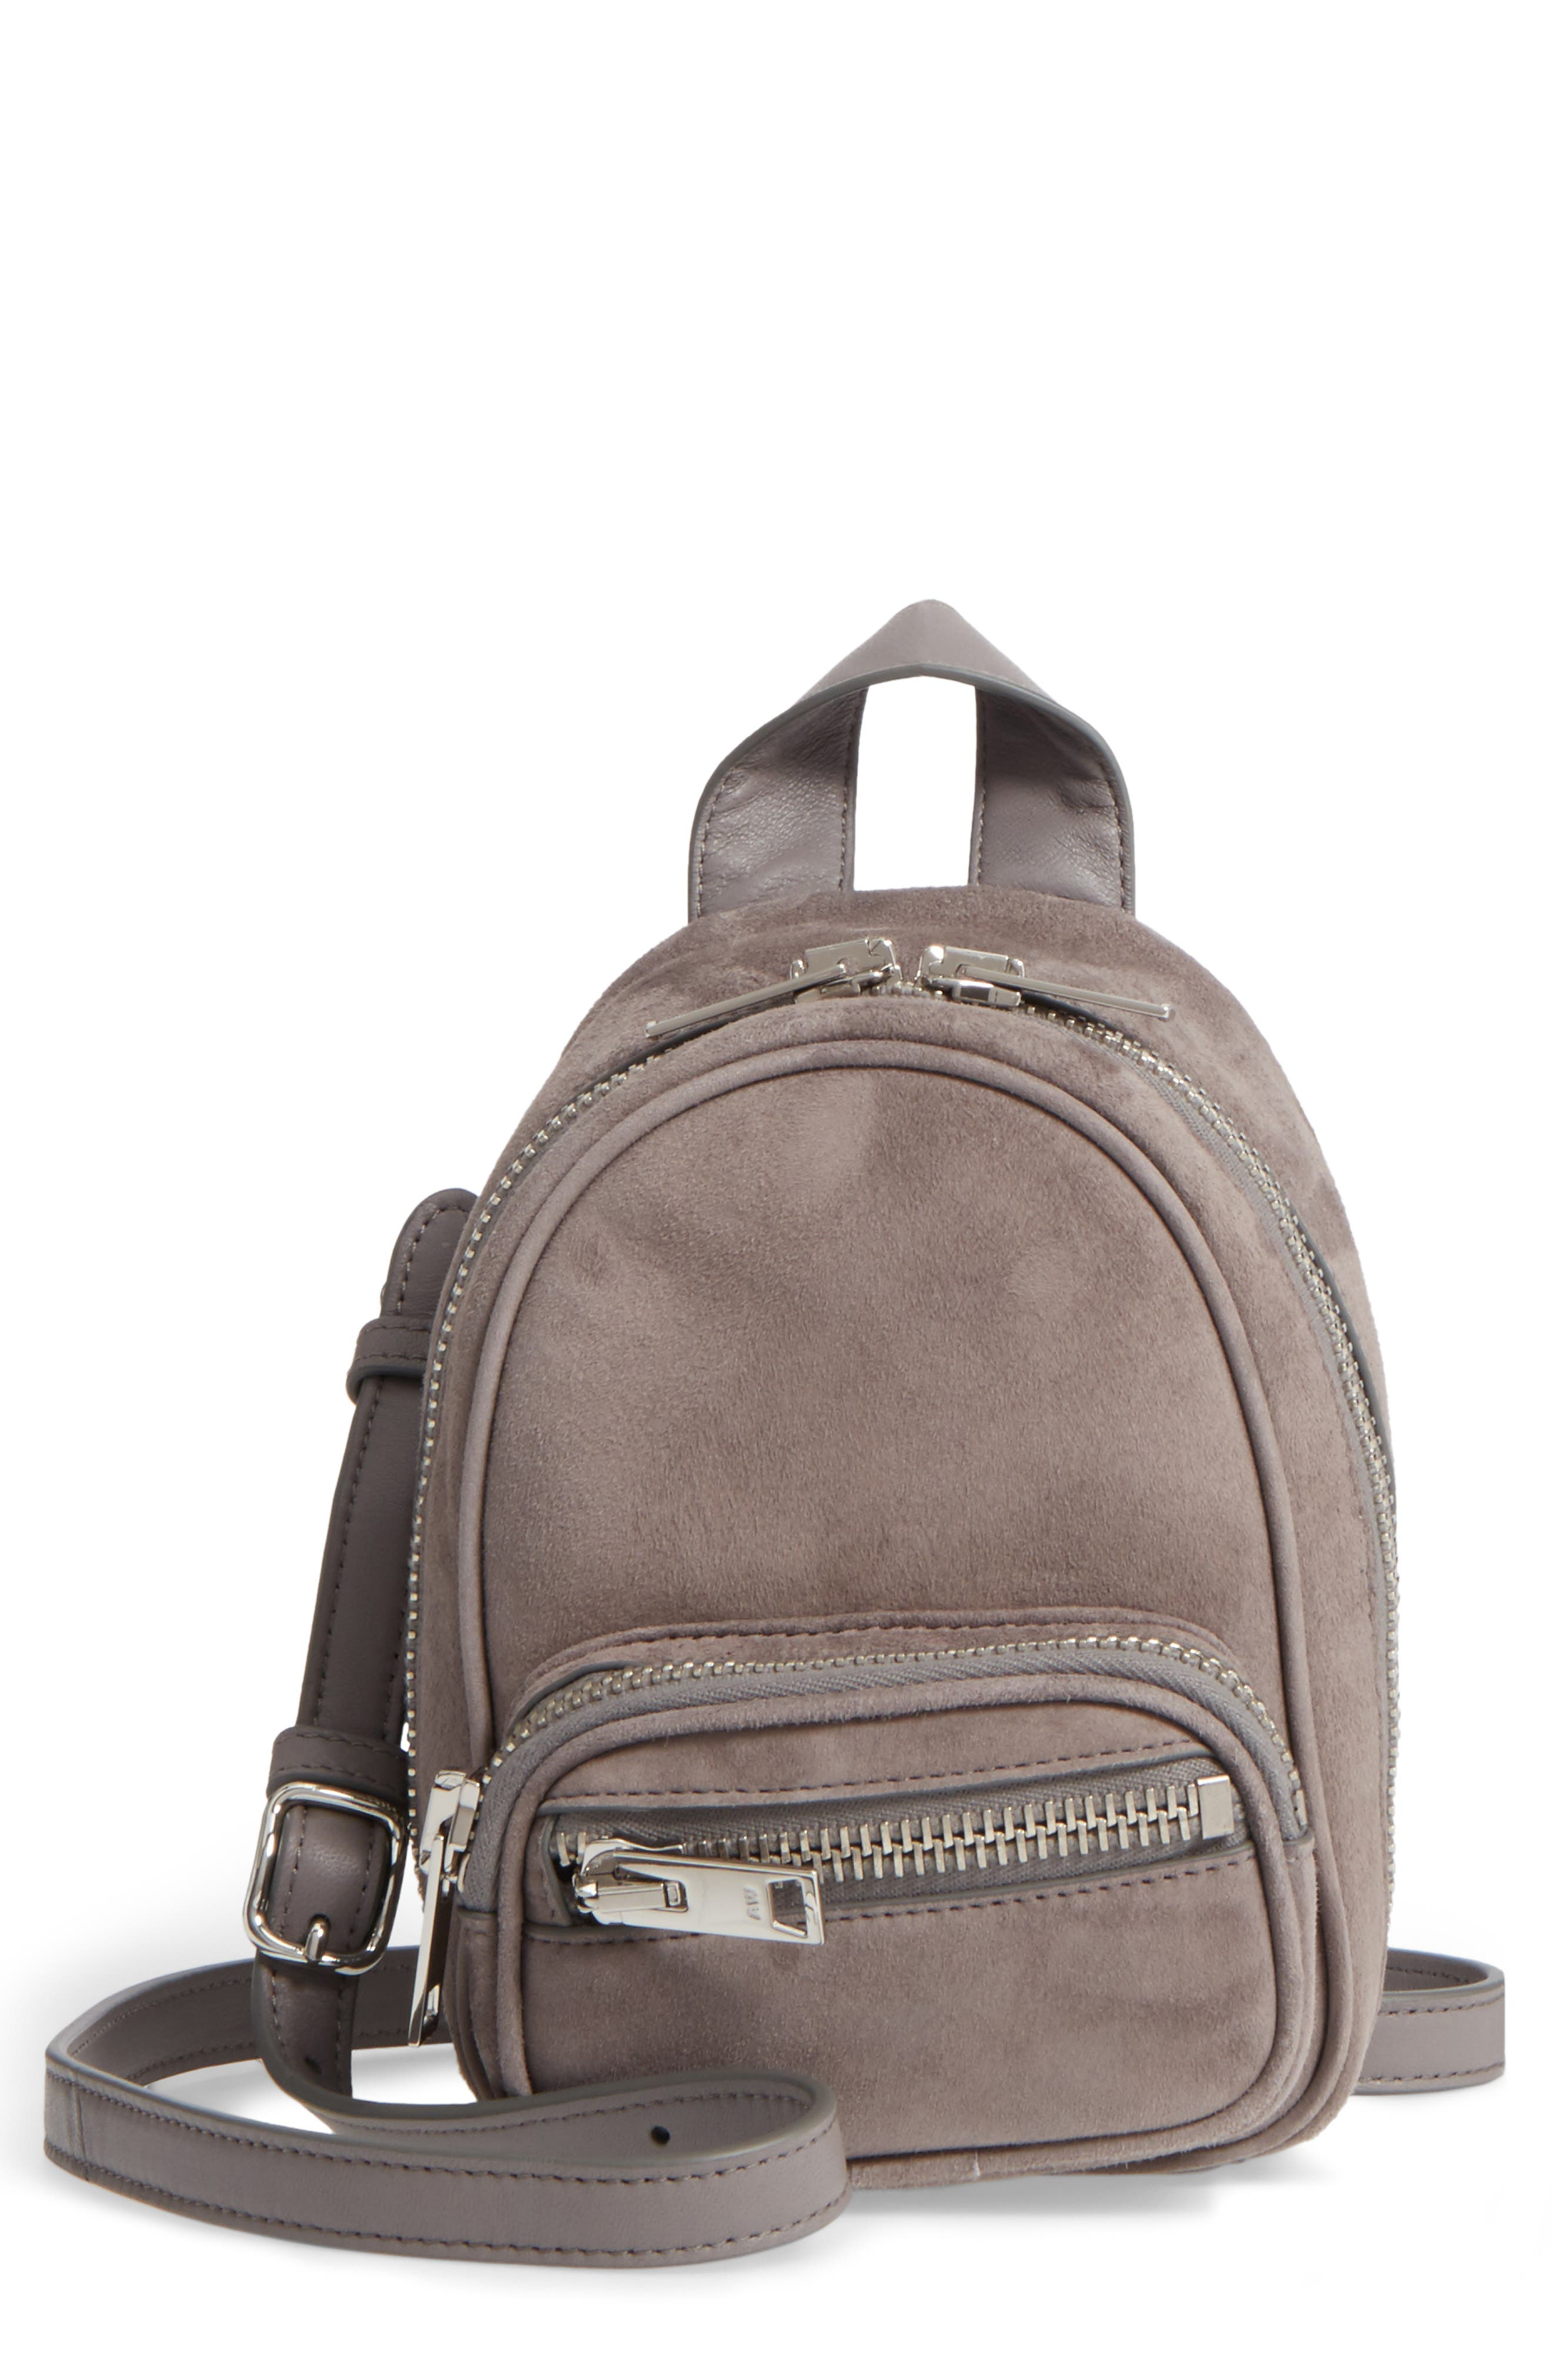 ALEXANDER WANG Mini Attica Leather Crossbody Backpack